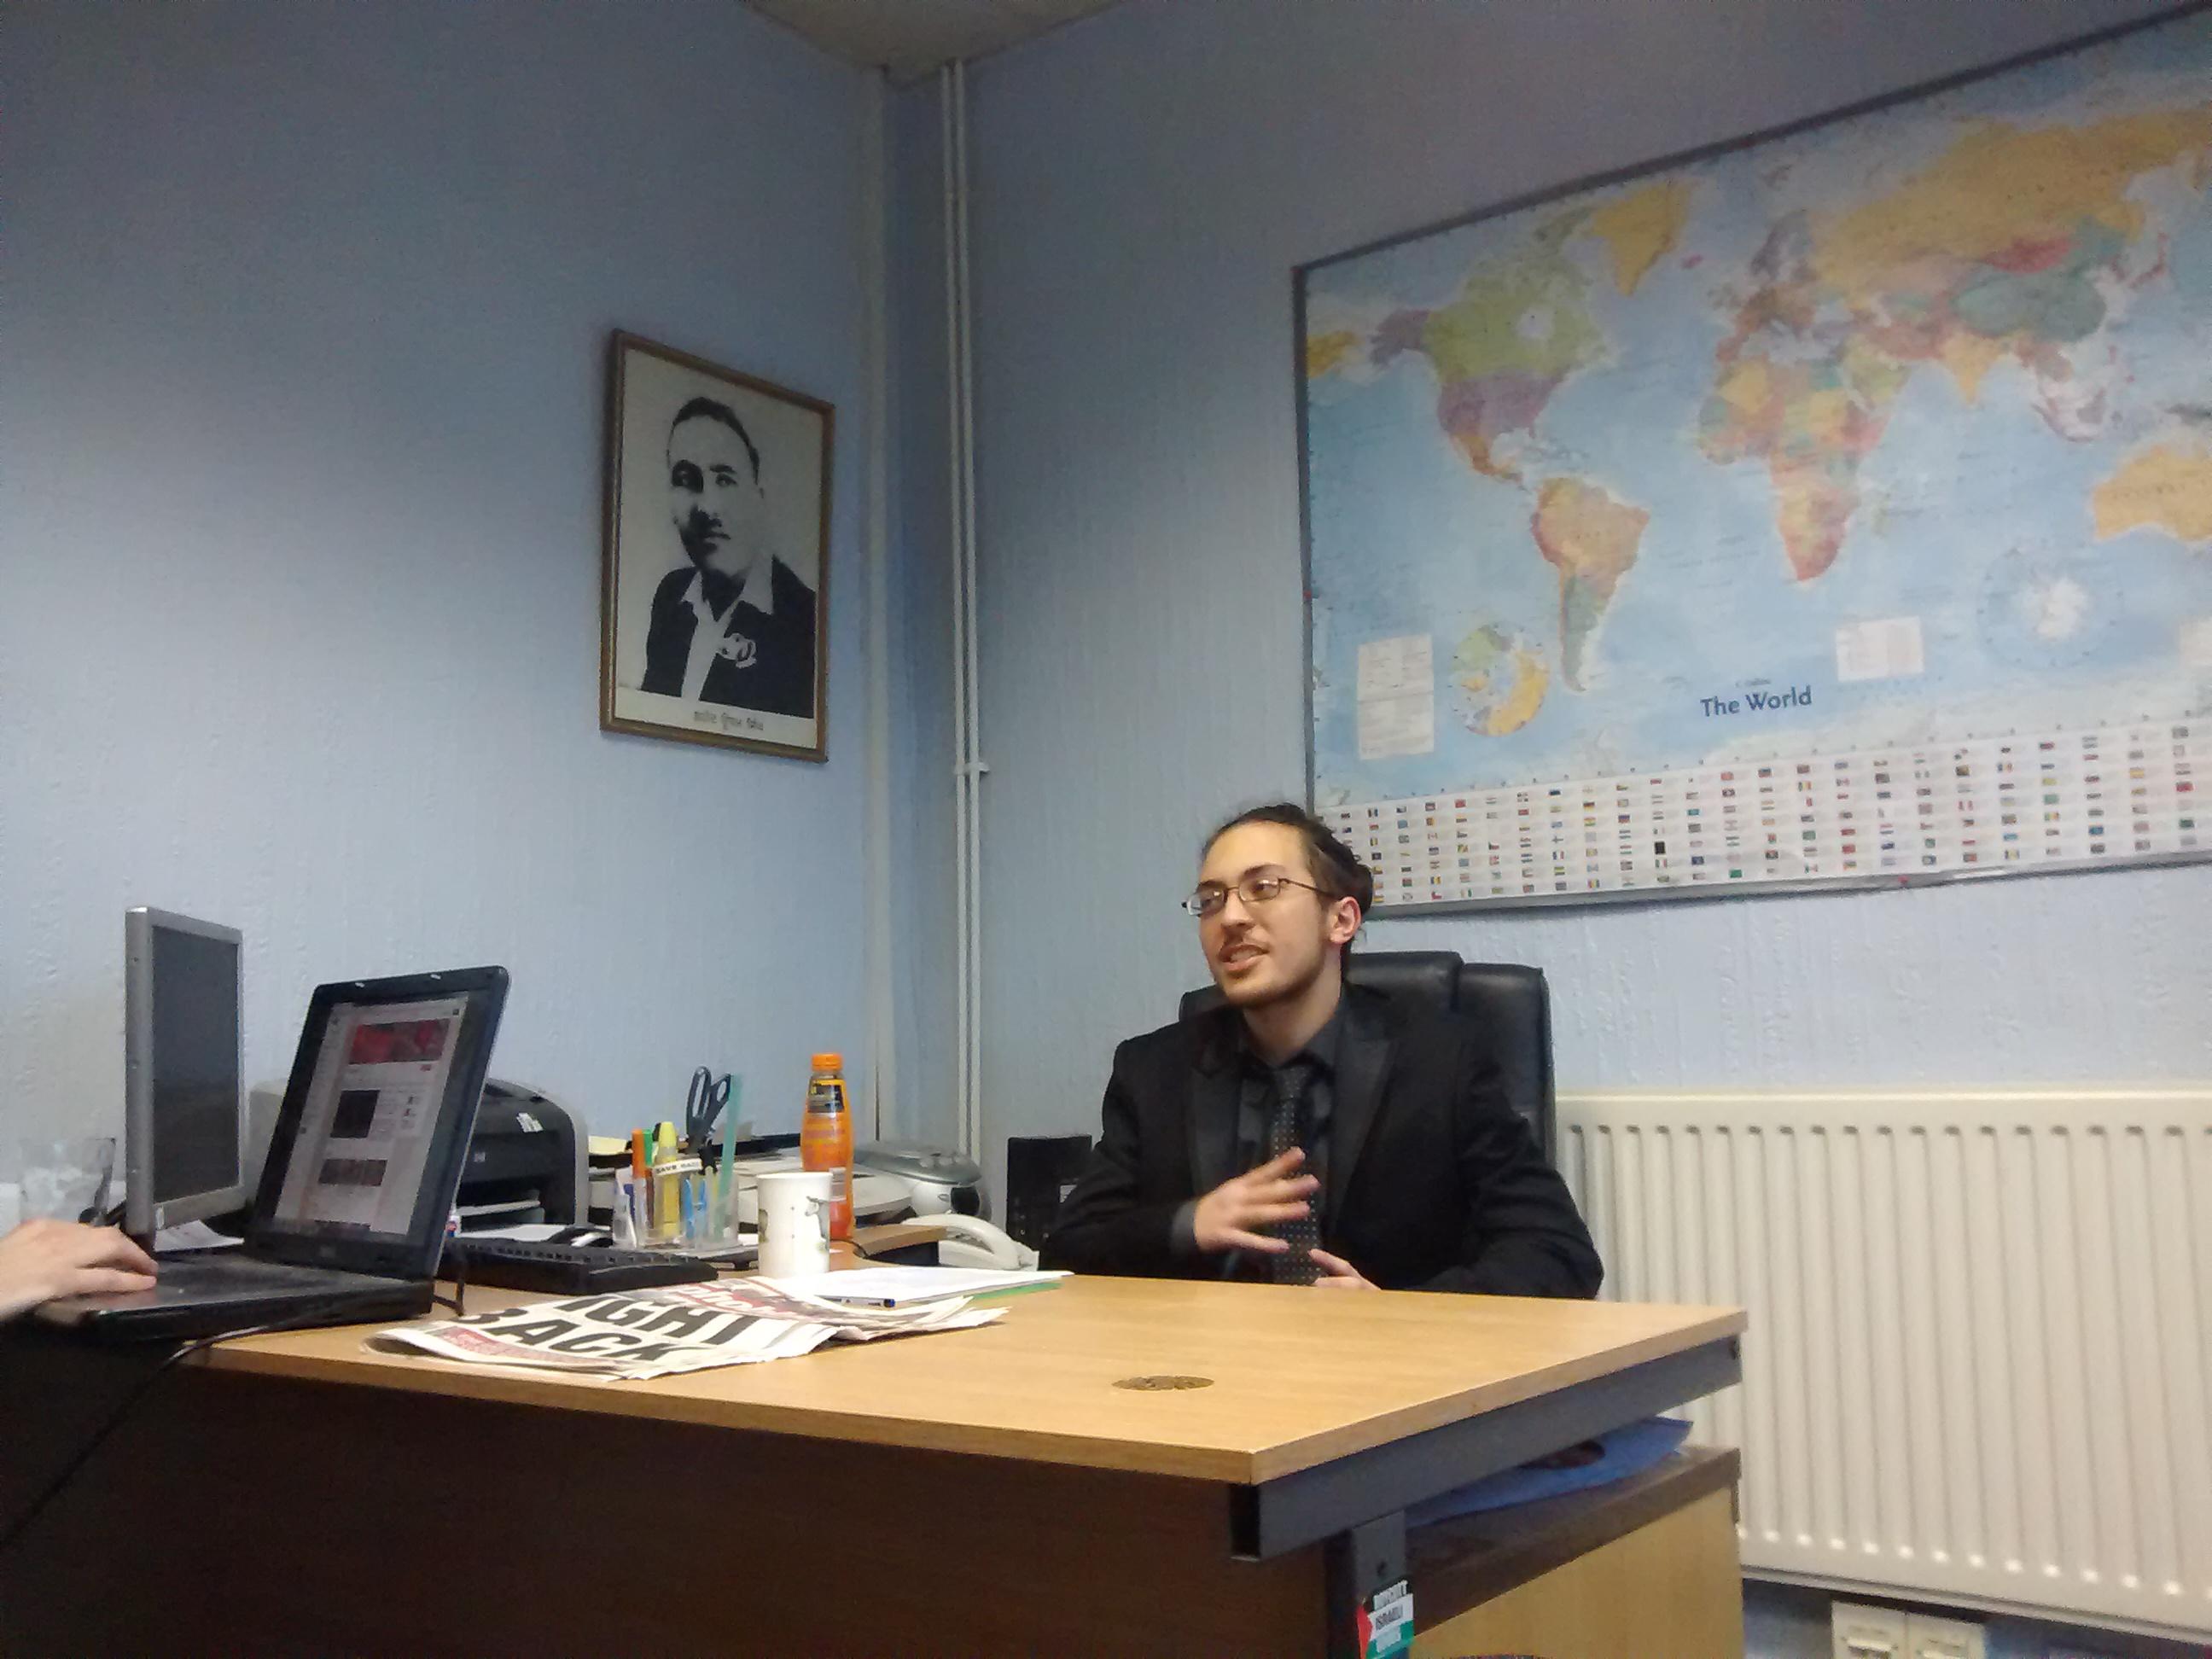 comrade Aberrabii speaks to the meeting in Birmingham